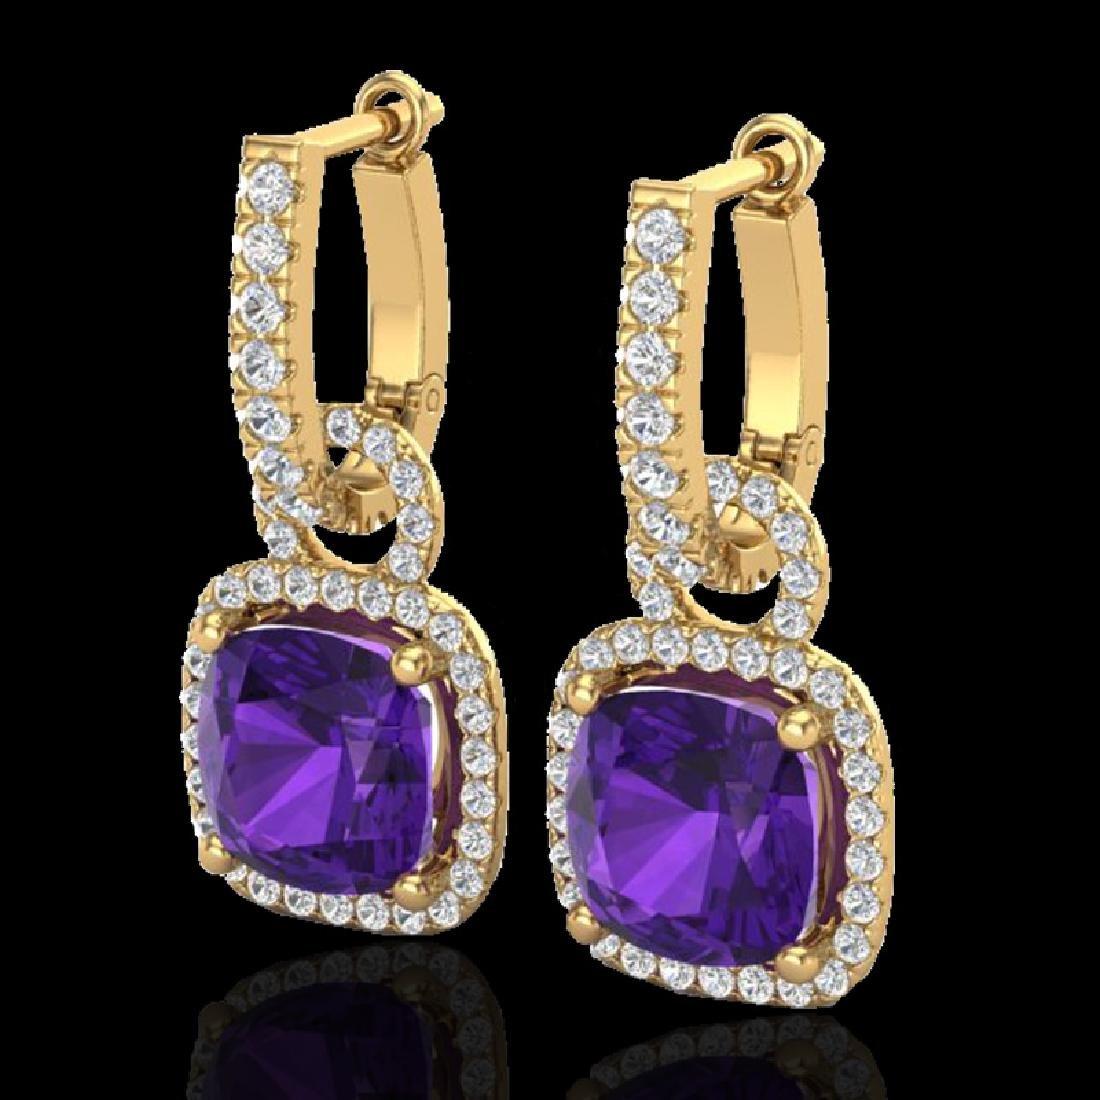 7 CTW Amethyst & Micro Pave VS/SI Diamond Earrings 18K